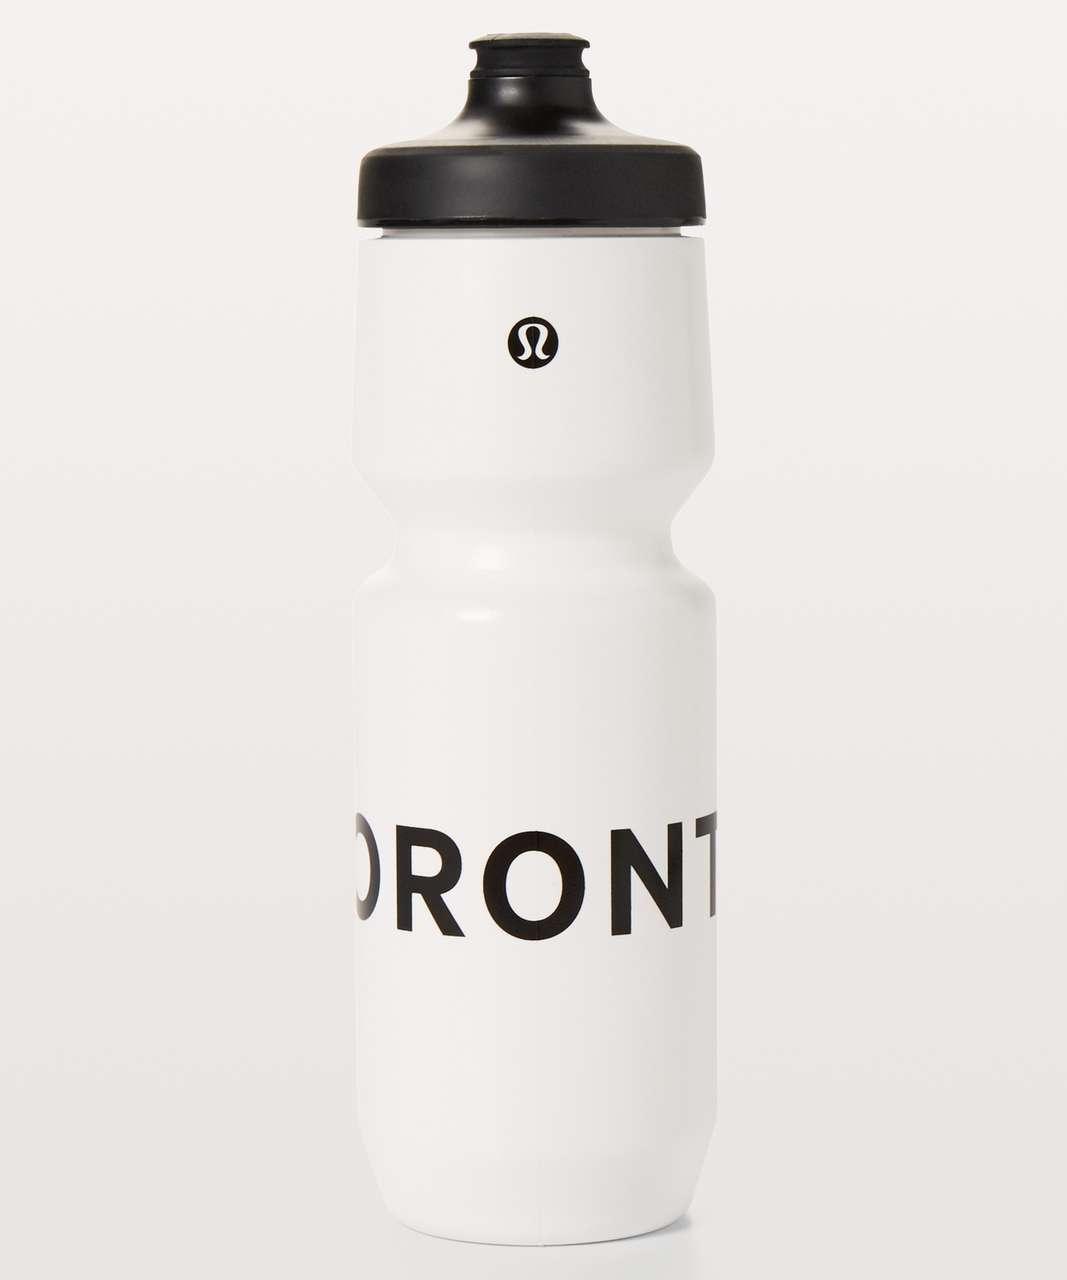 Lululemon Purist Cycling Water Bottle II City - Pwdc